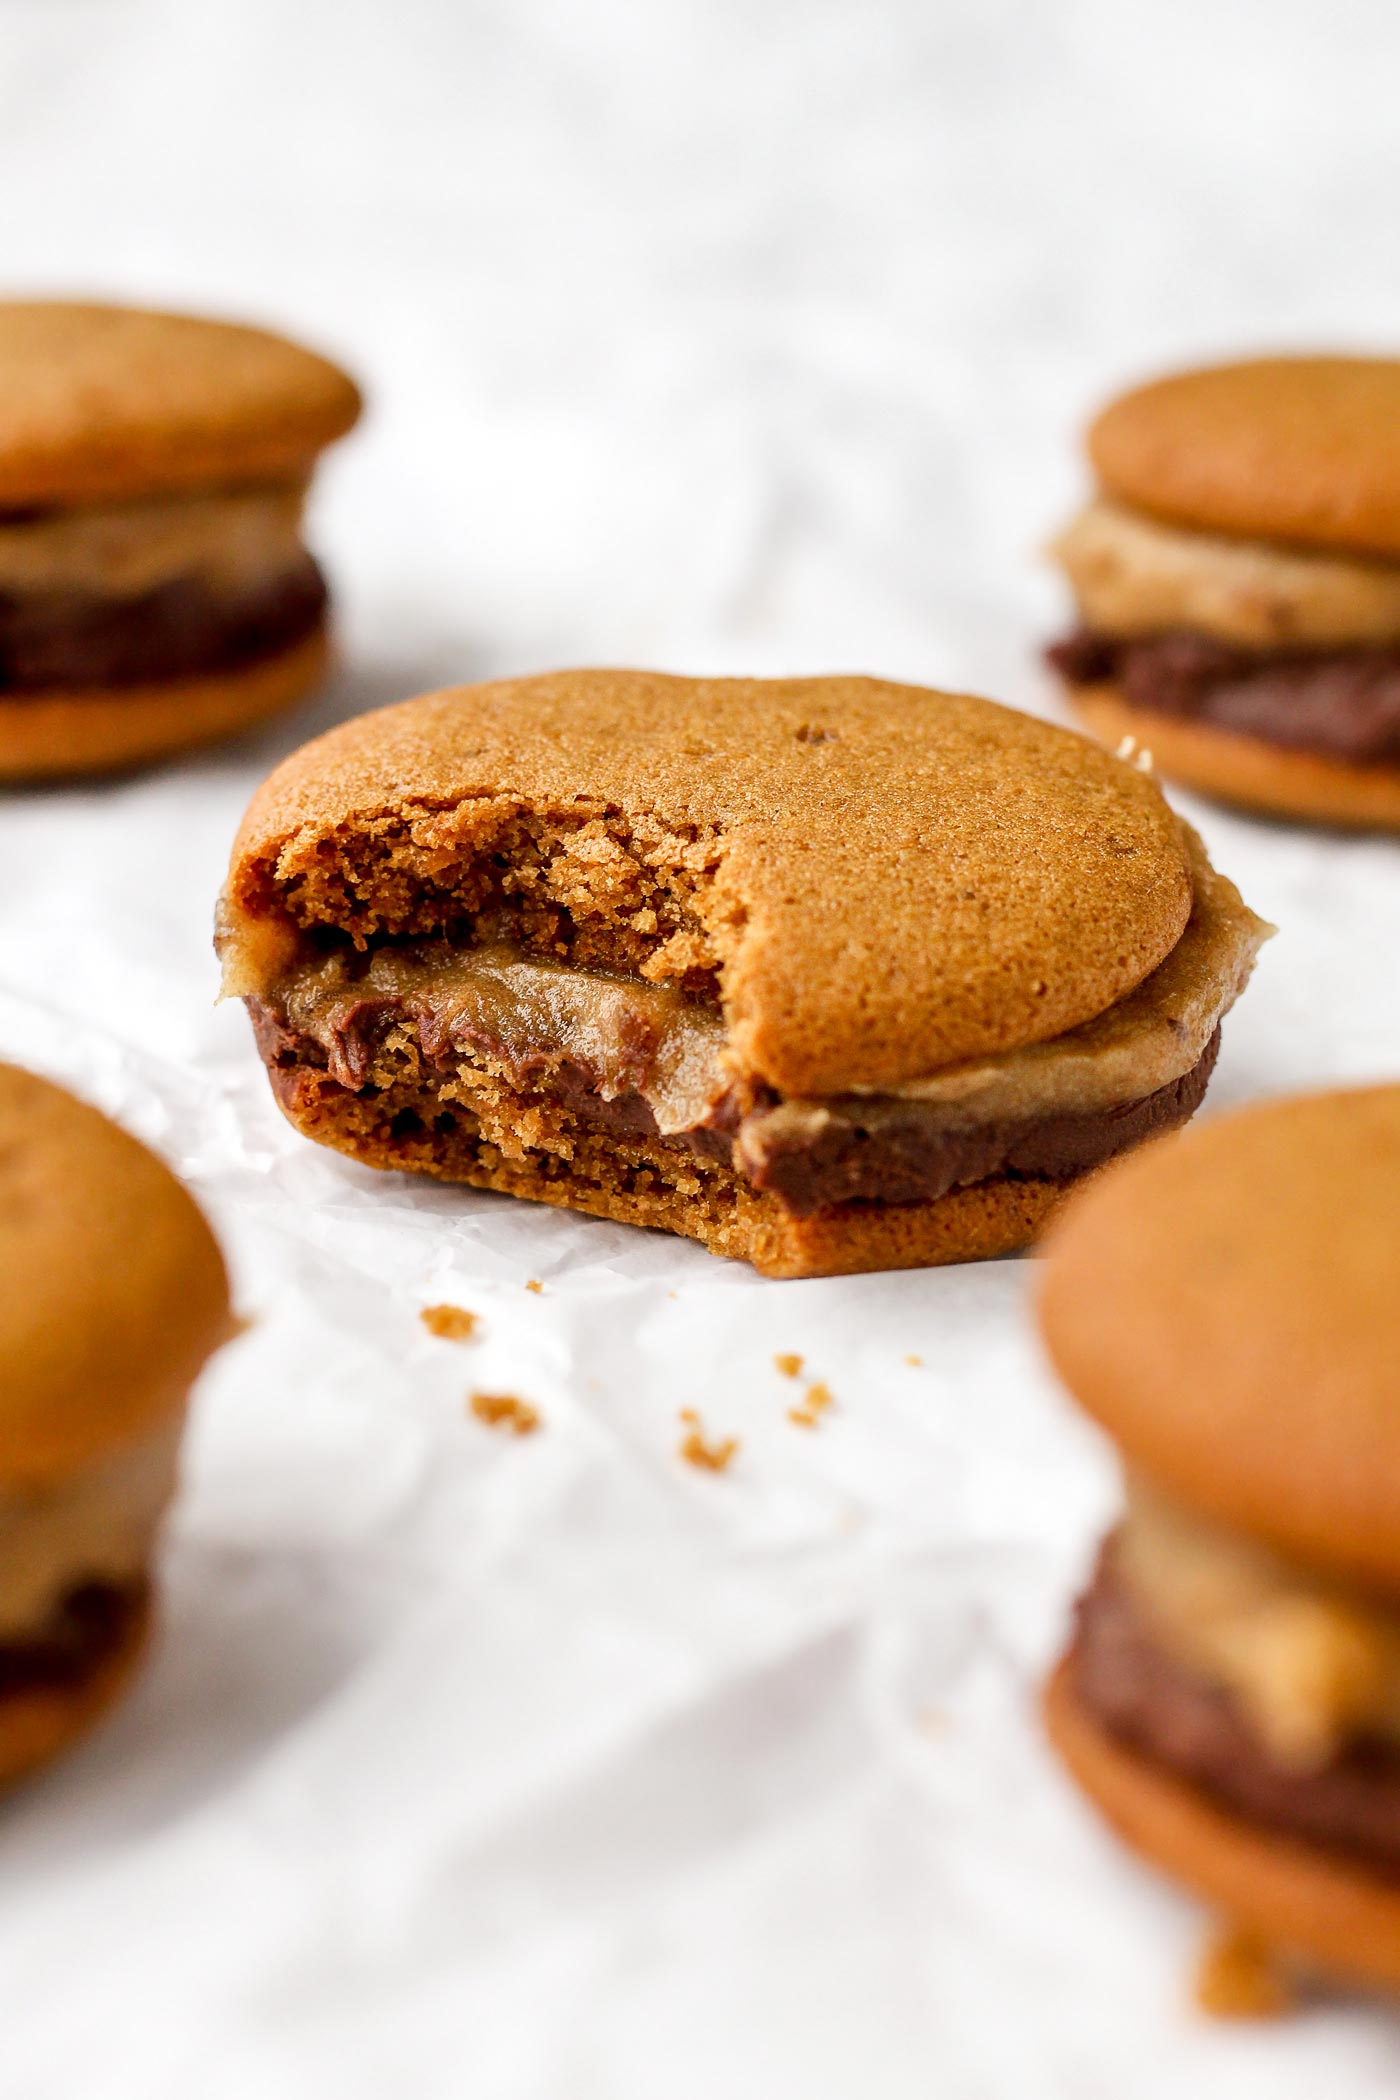 Caramel Chocolate Cookie Sandwiches (Vegan + GF)